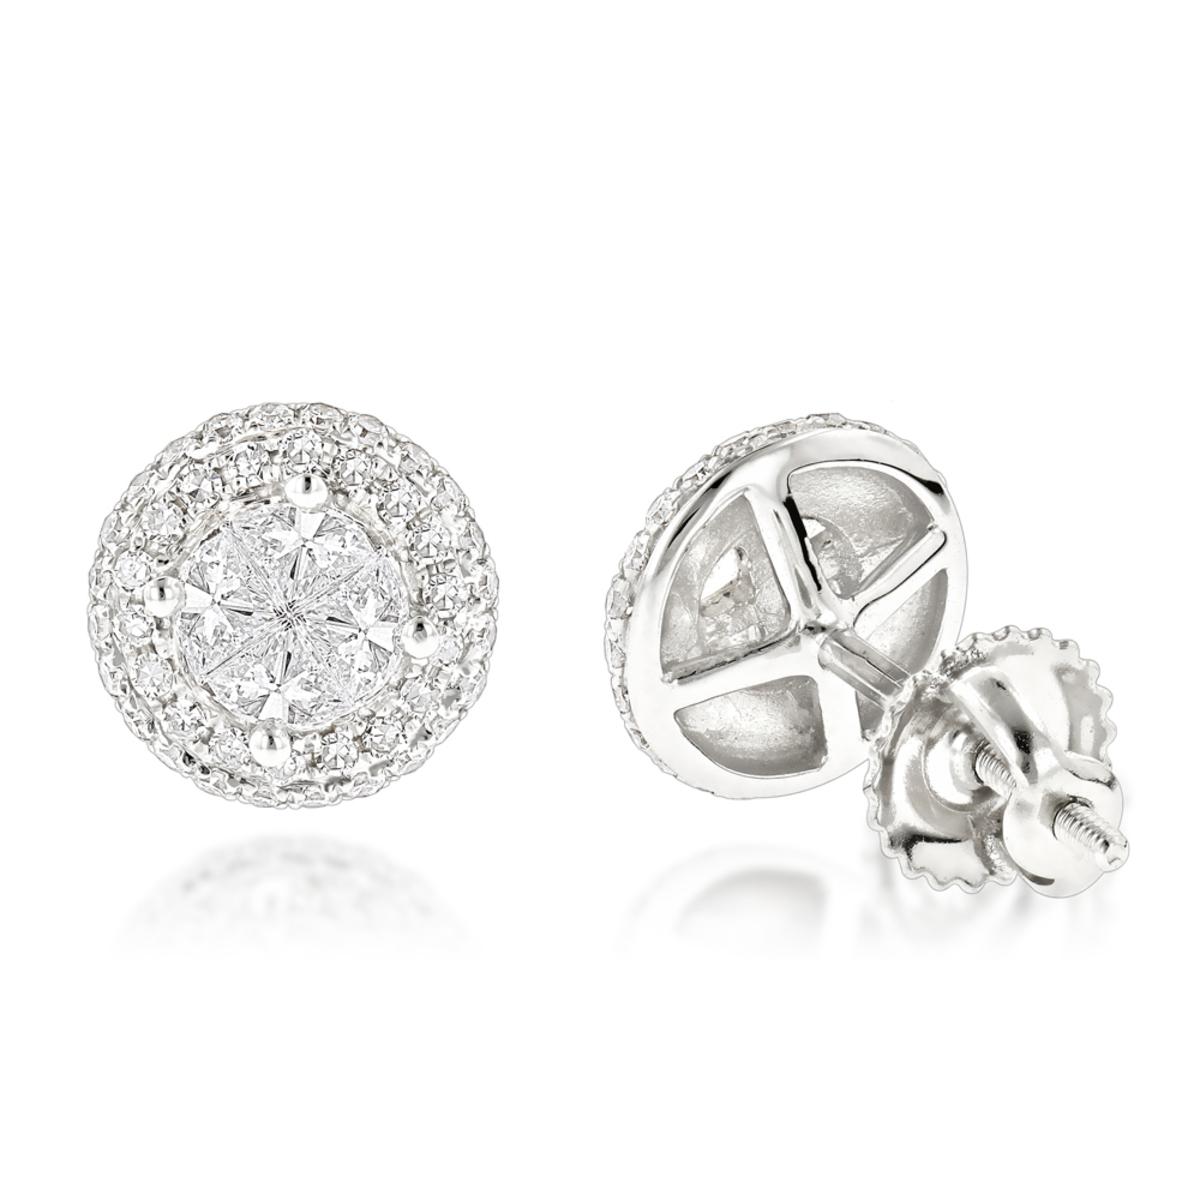 Halo Diamond Cluster Earrings 14K Gold Studs 1.25ct